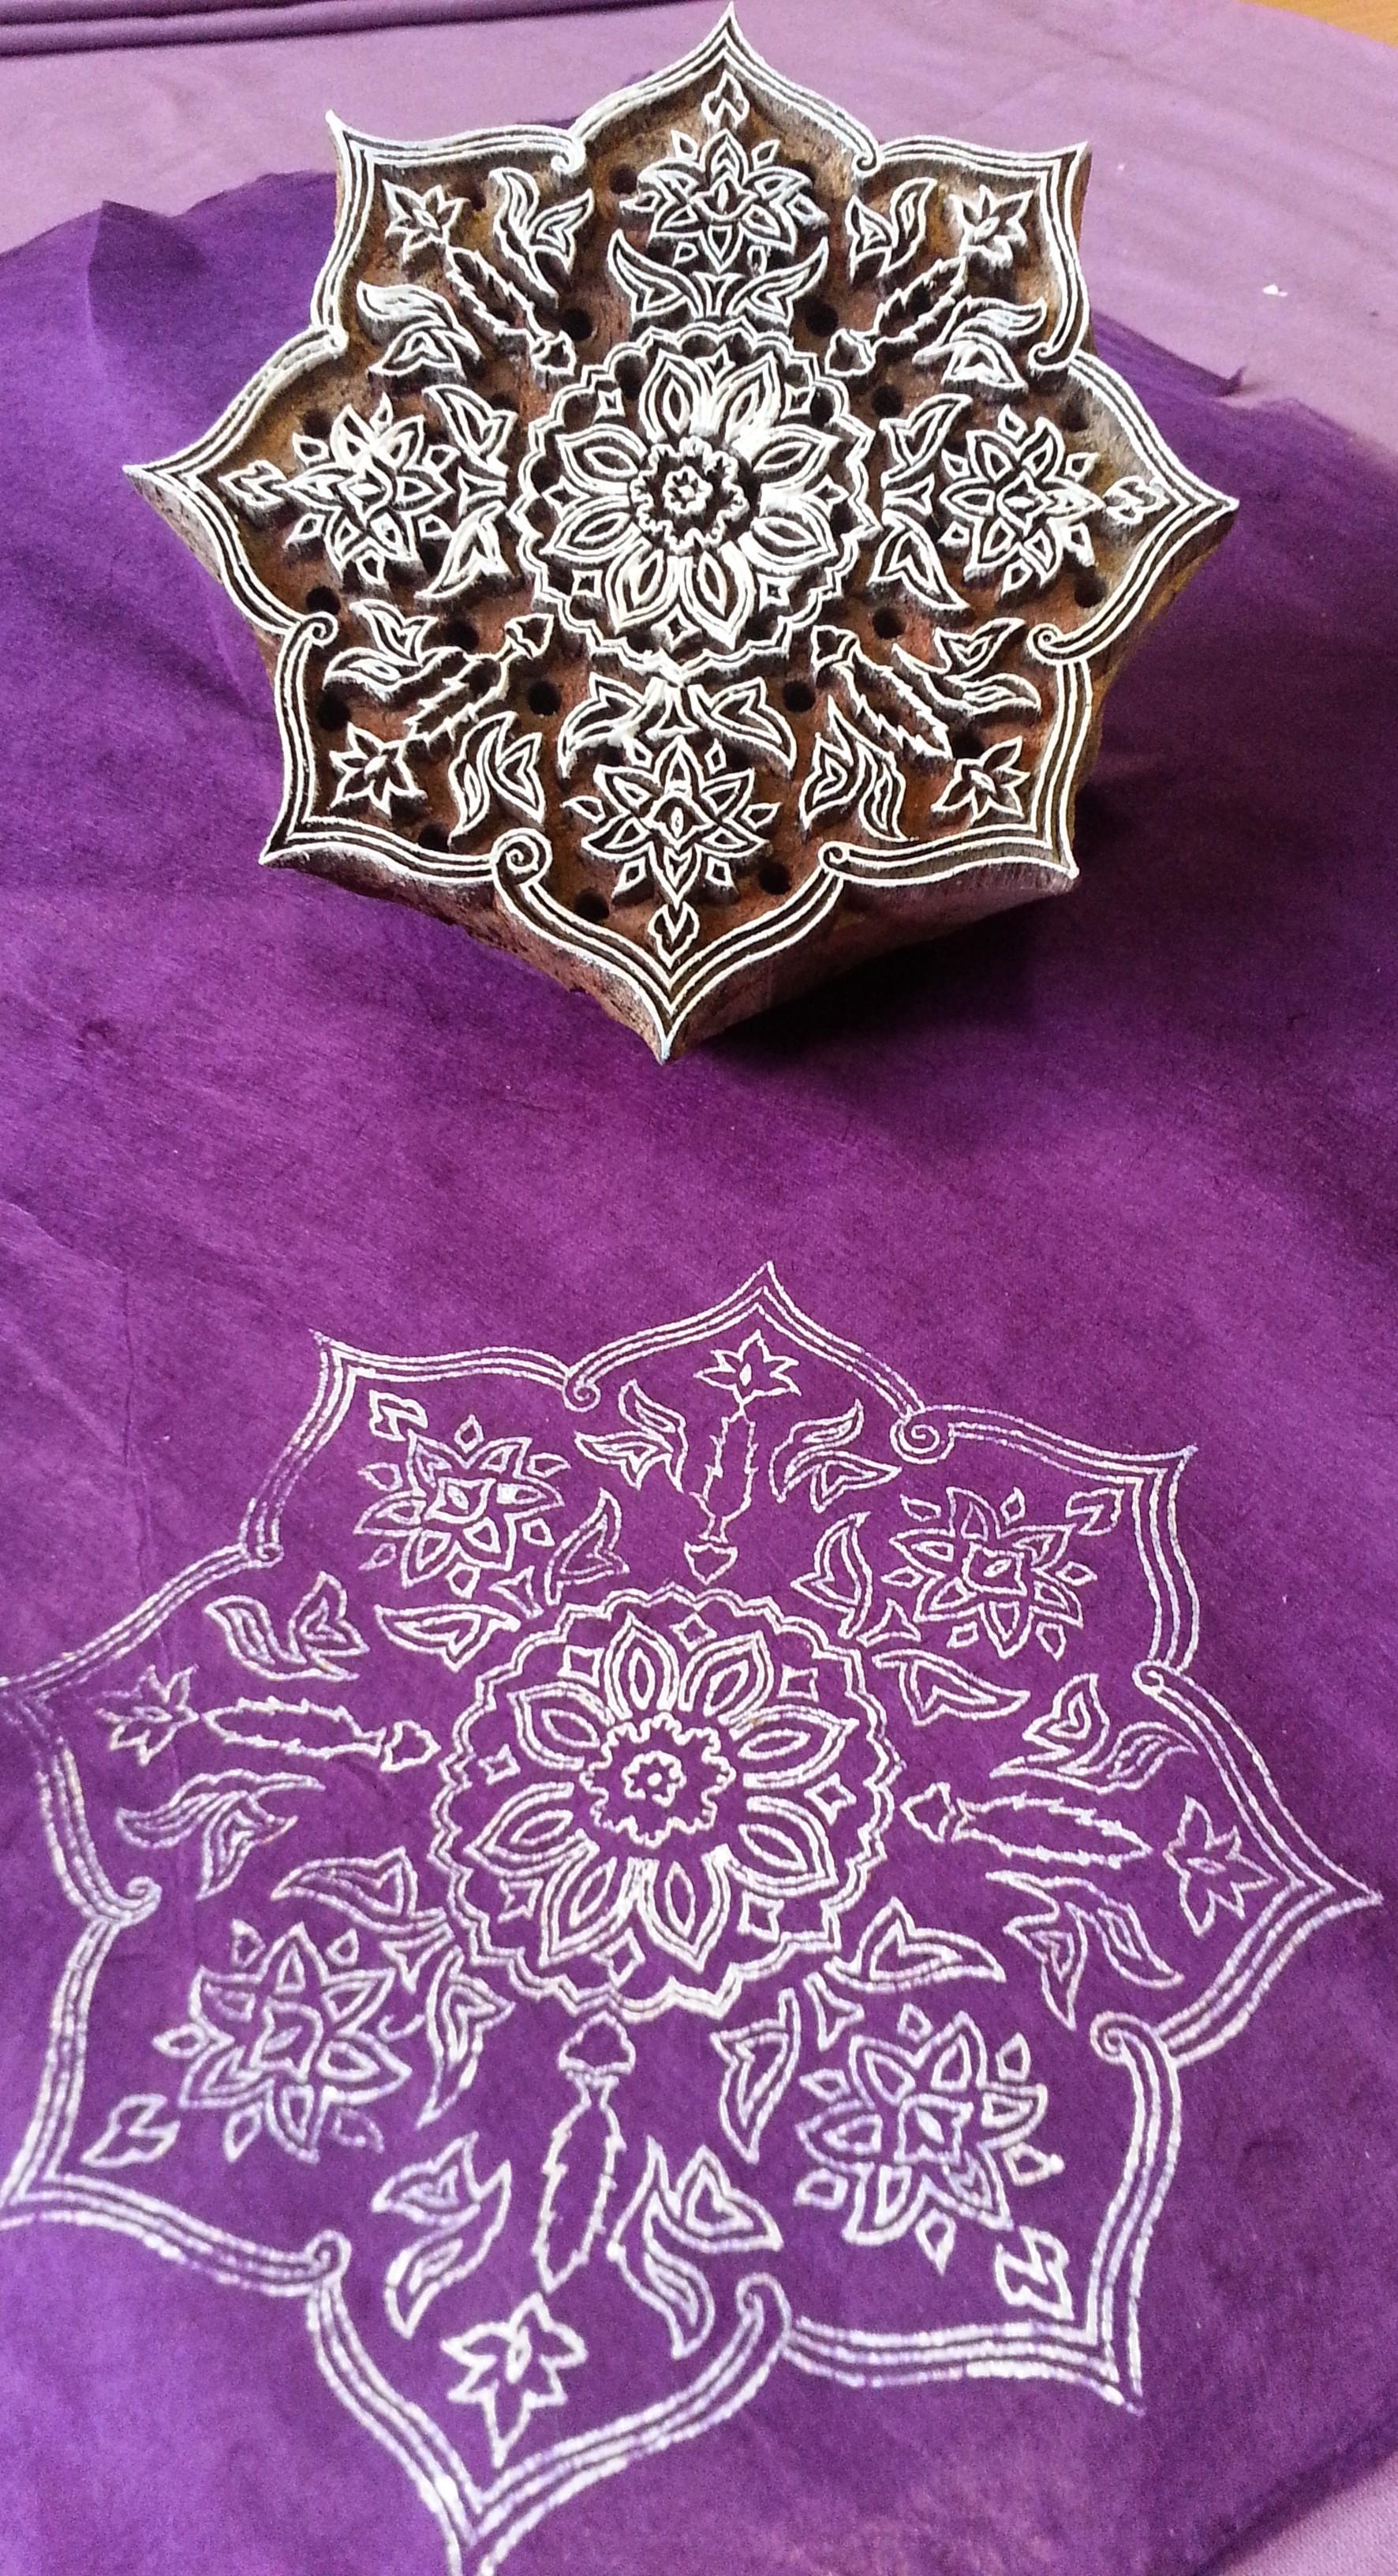 Work in Progress ~ Indian Art, Asian Art, Mughal Art, Islamic Art, Textile Art, Pattern Design, Shaheen Kasmani